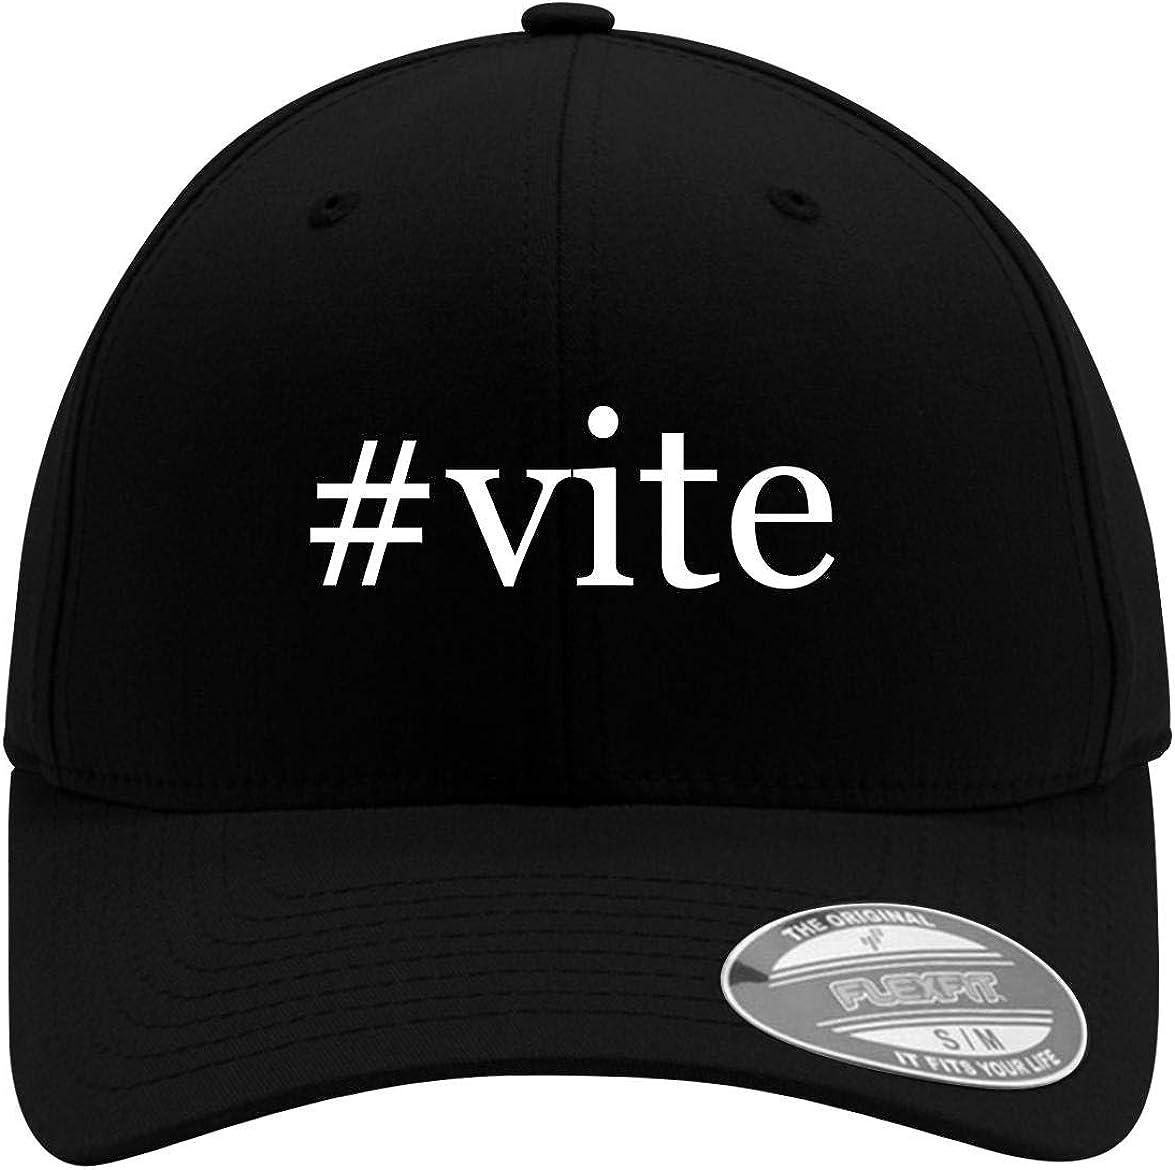 #vite - Adult Men's Hashtag Flexfit Baseball Hat Cap